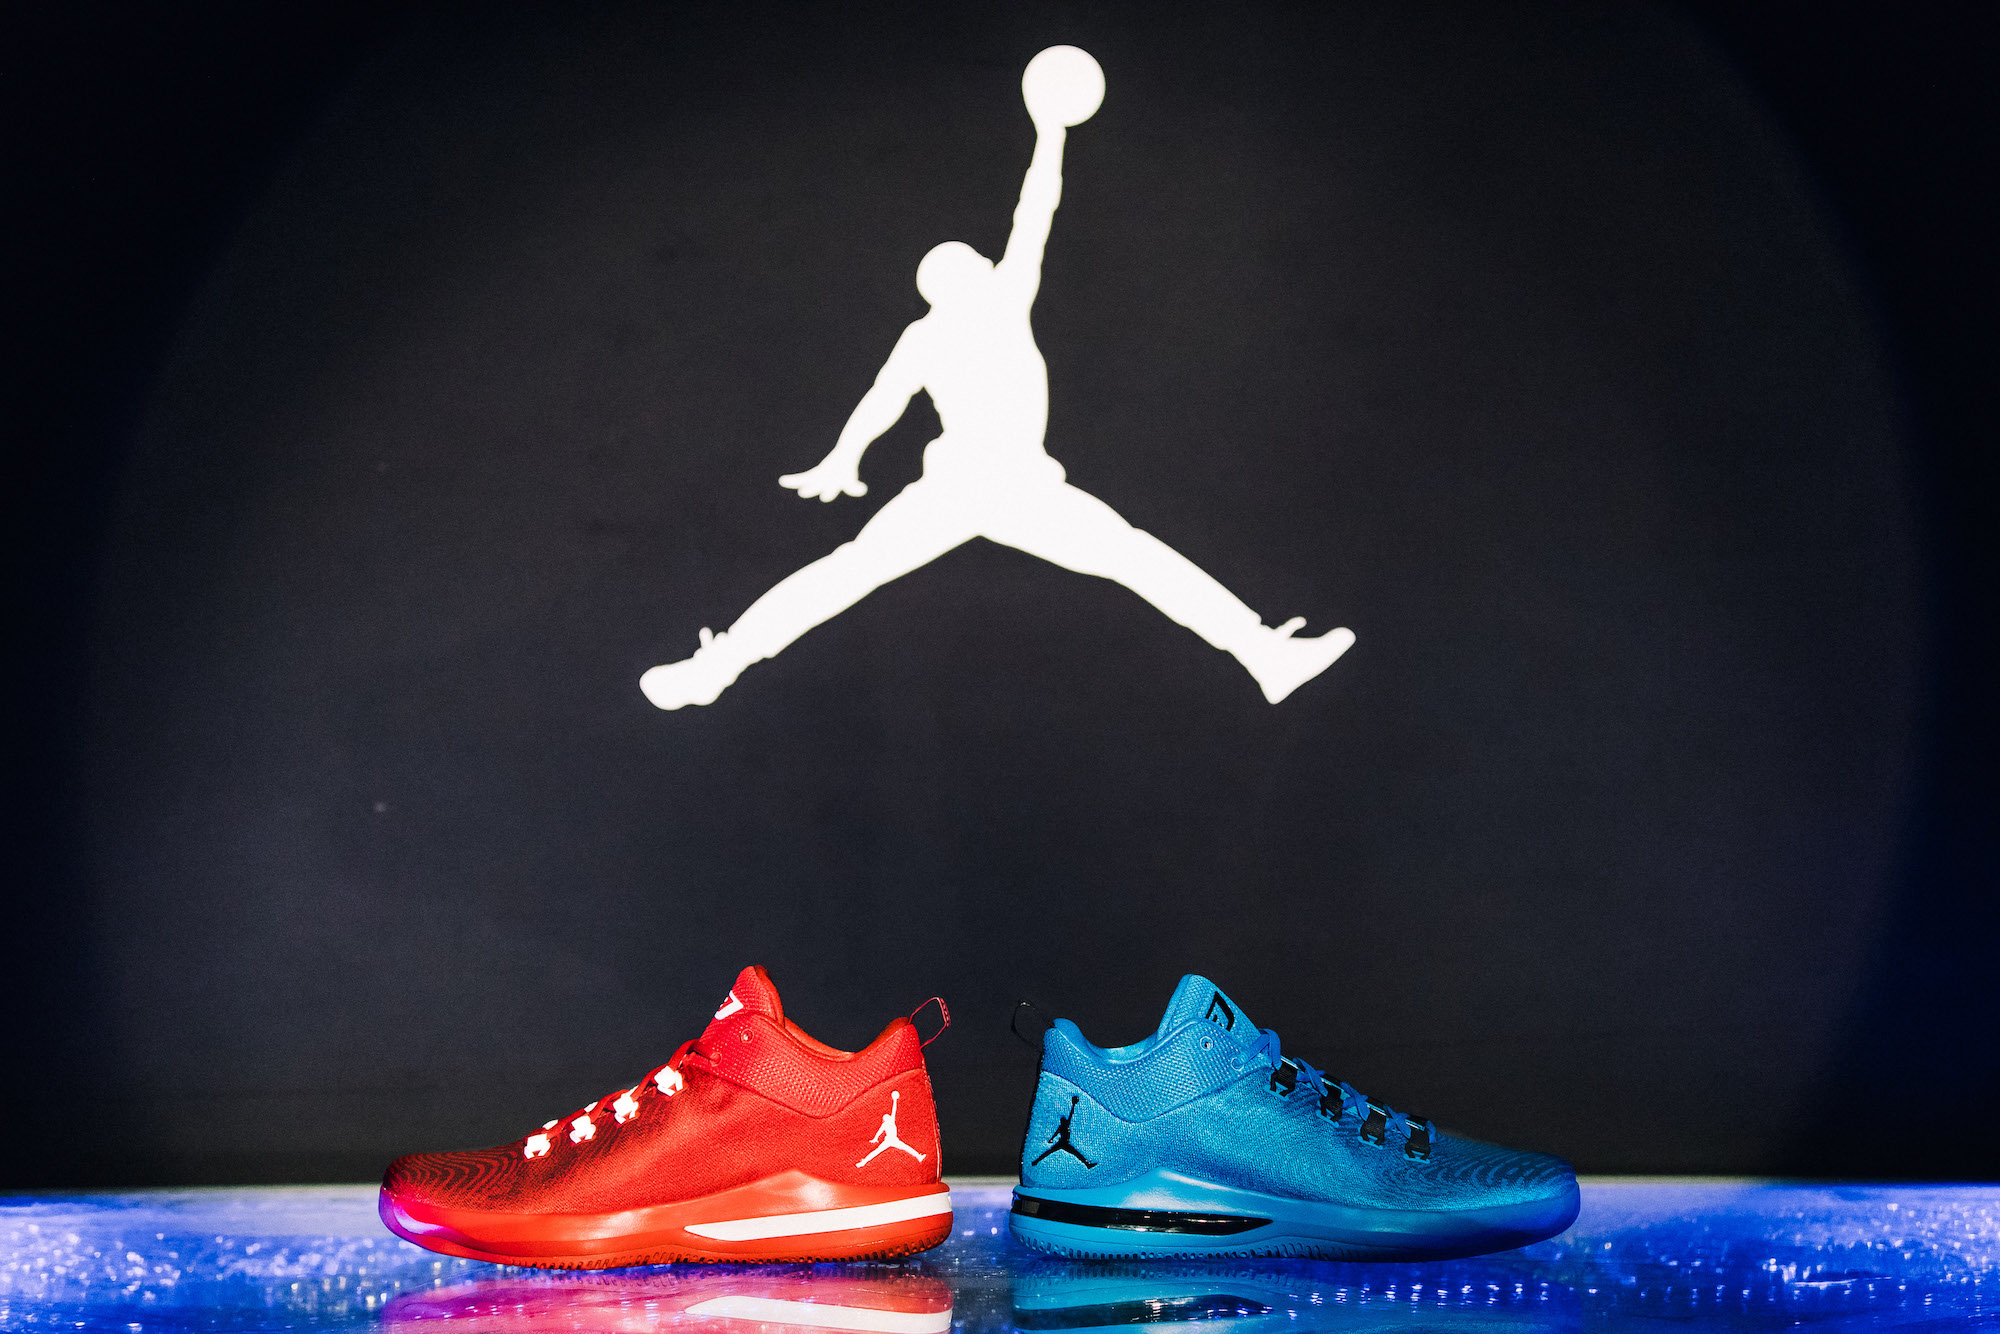 Jordan brand classic PE jordan CP3.X